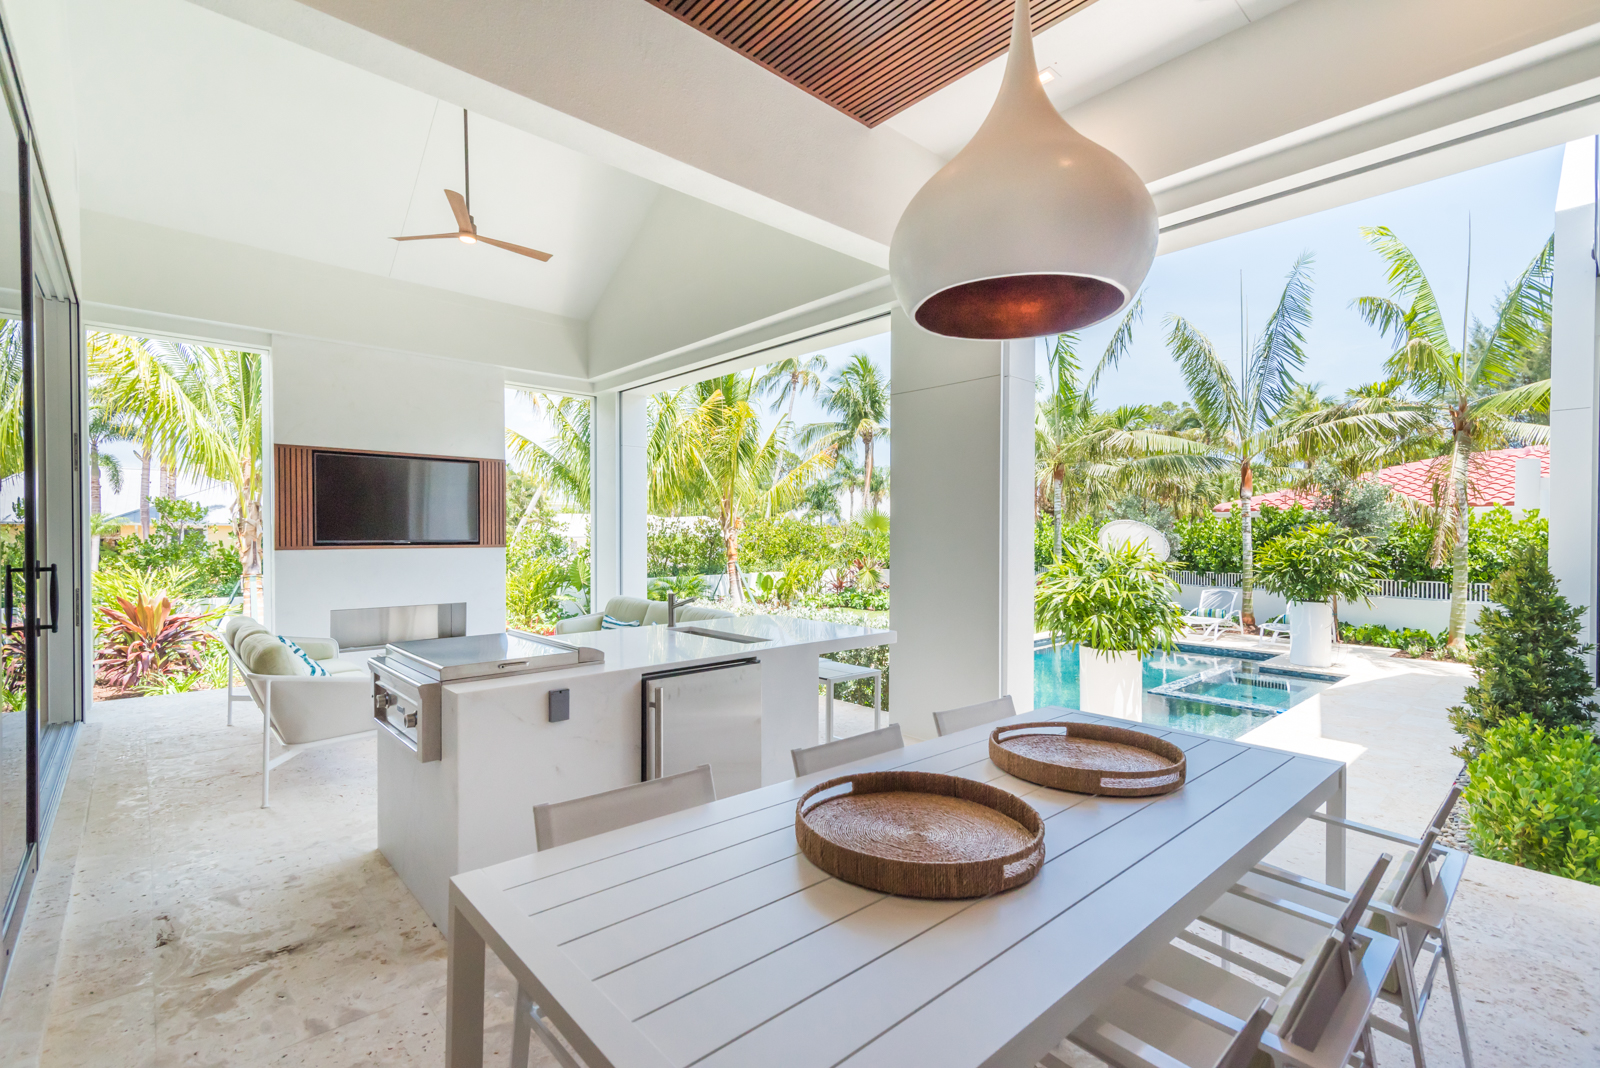 Jeffrey Fisher Home Luxury Interior Design Imagined Home Decor Outdoor Living Room Lanai